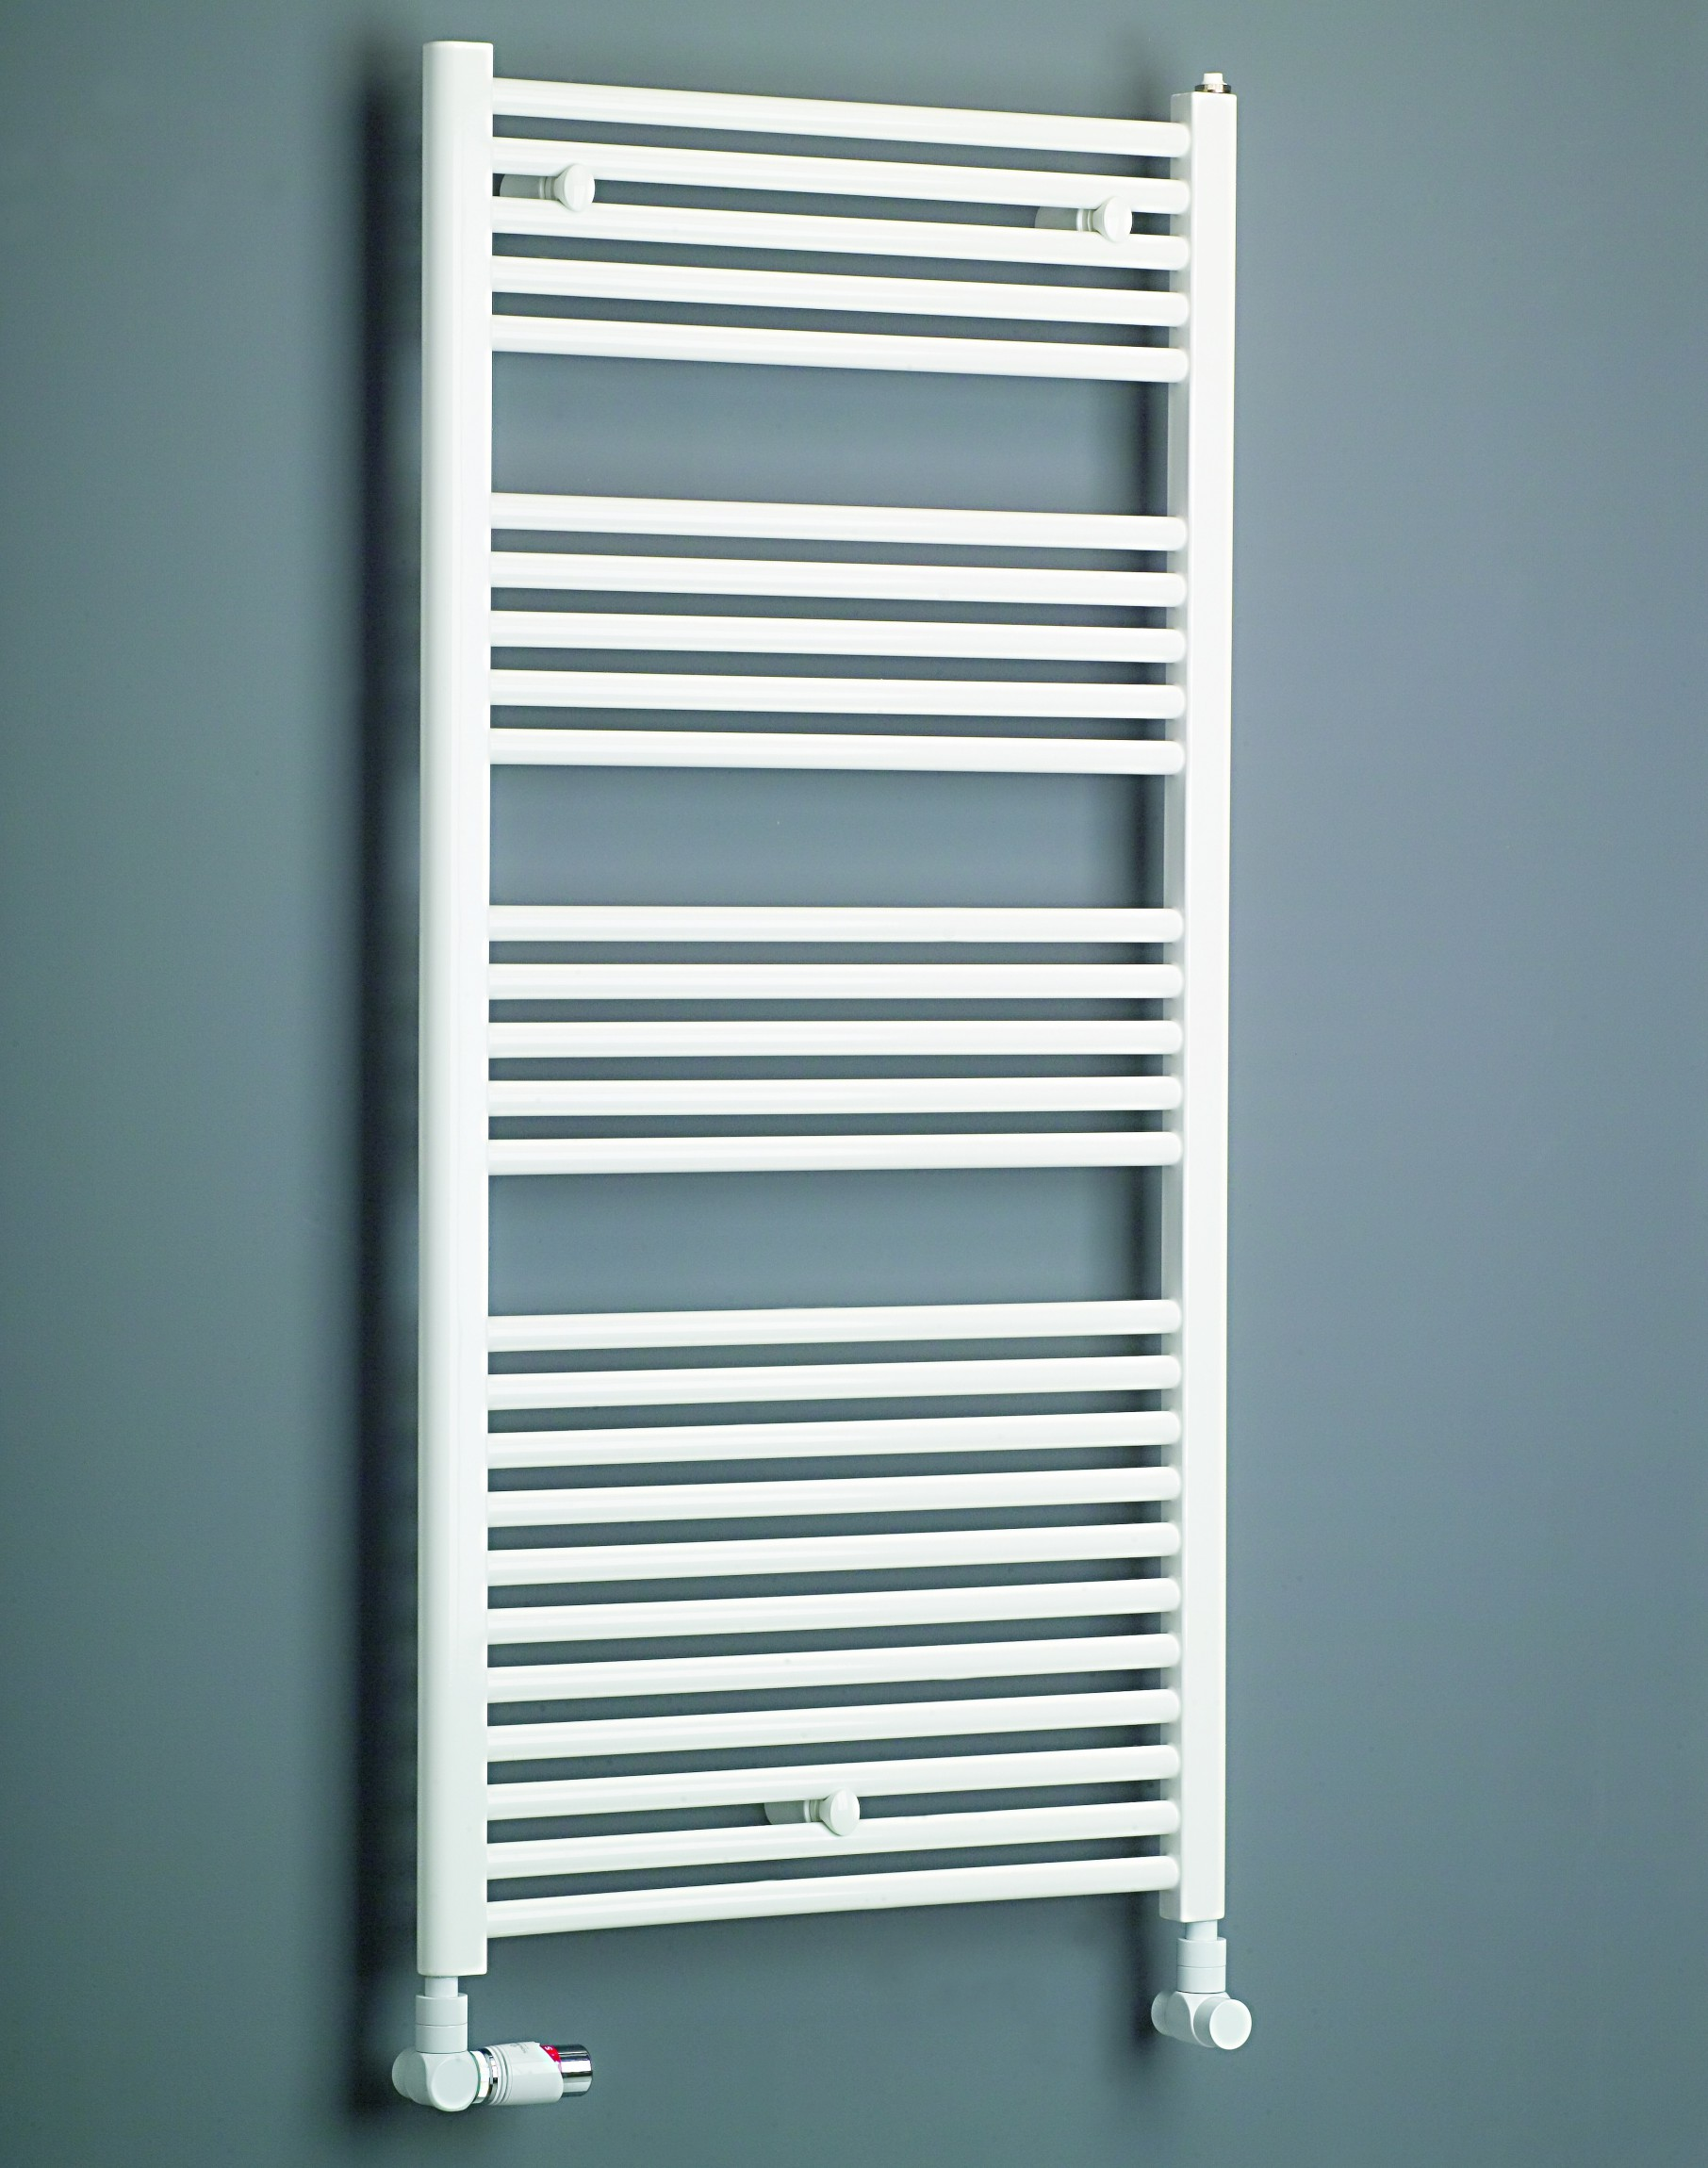 badheizk rper vertikal 1800 x 450 500 600 750 mm breit sonderanschlu. Black Bedroom Furniture Sets. Home Design Ideas